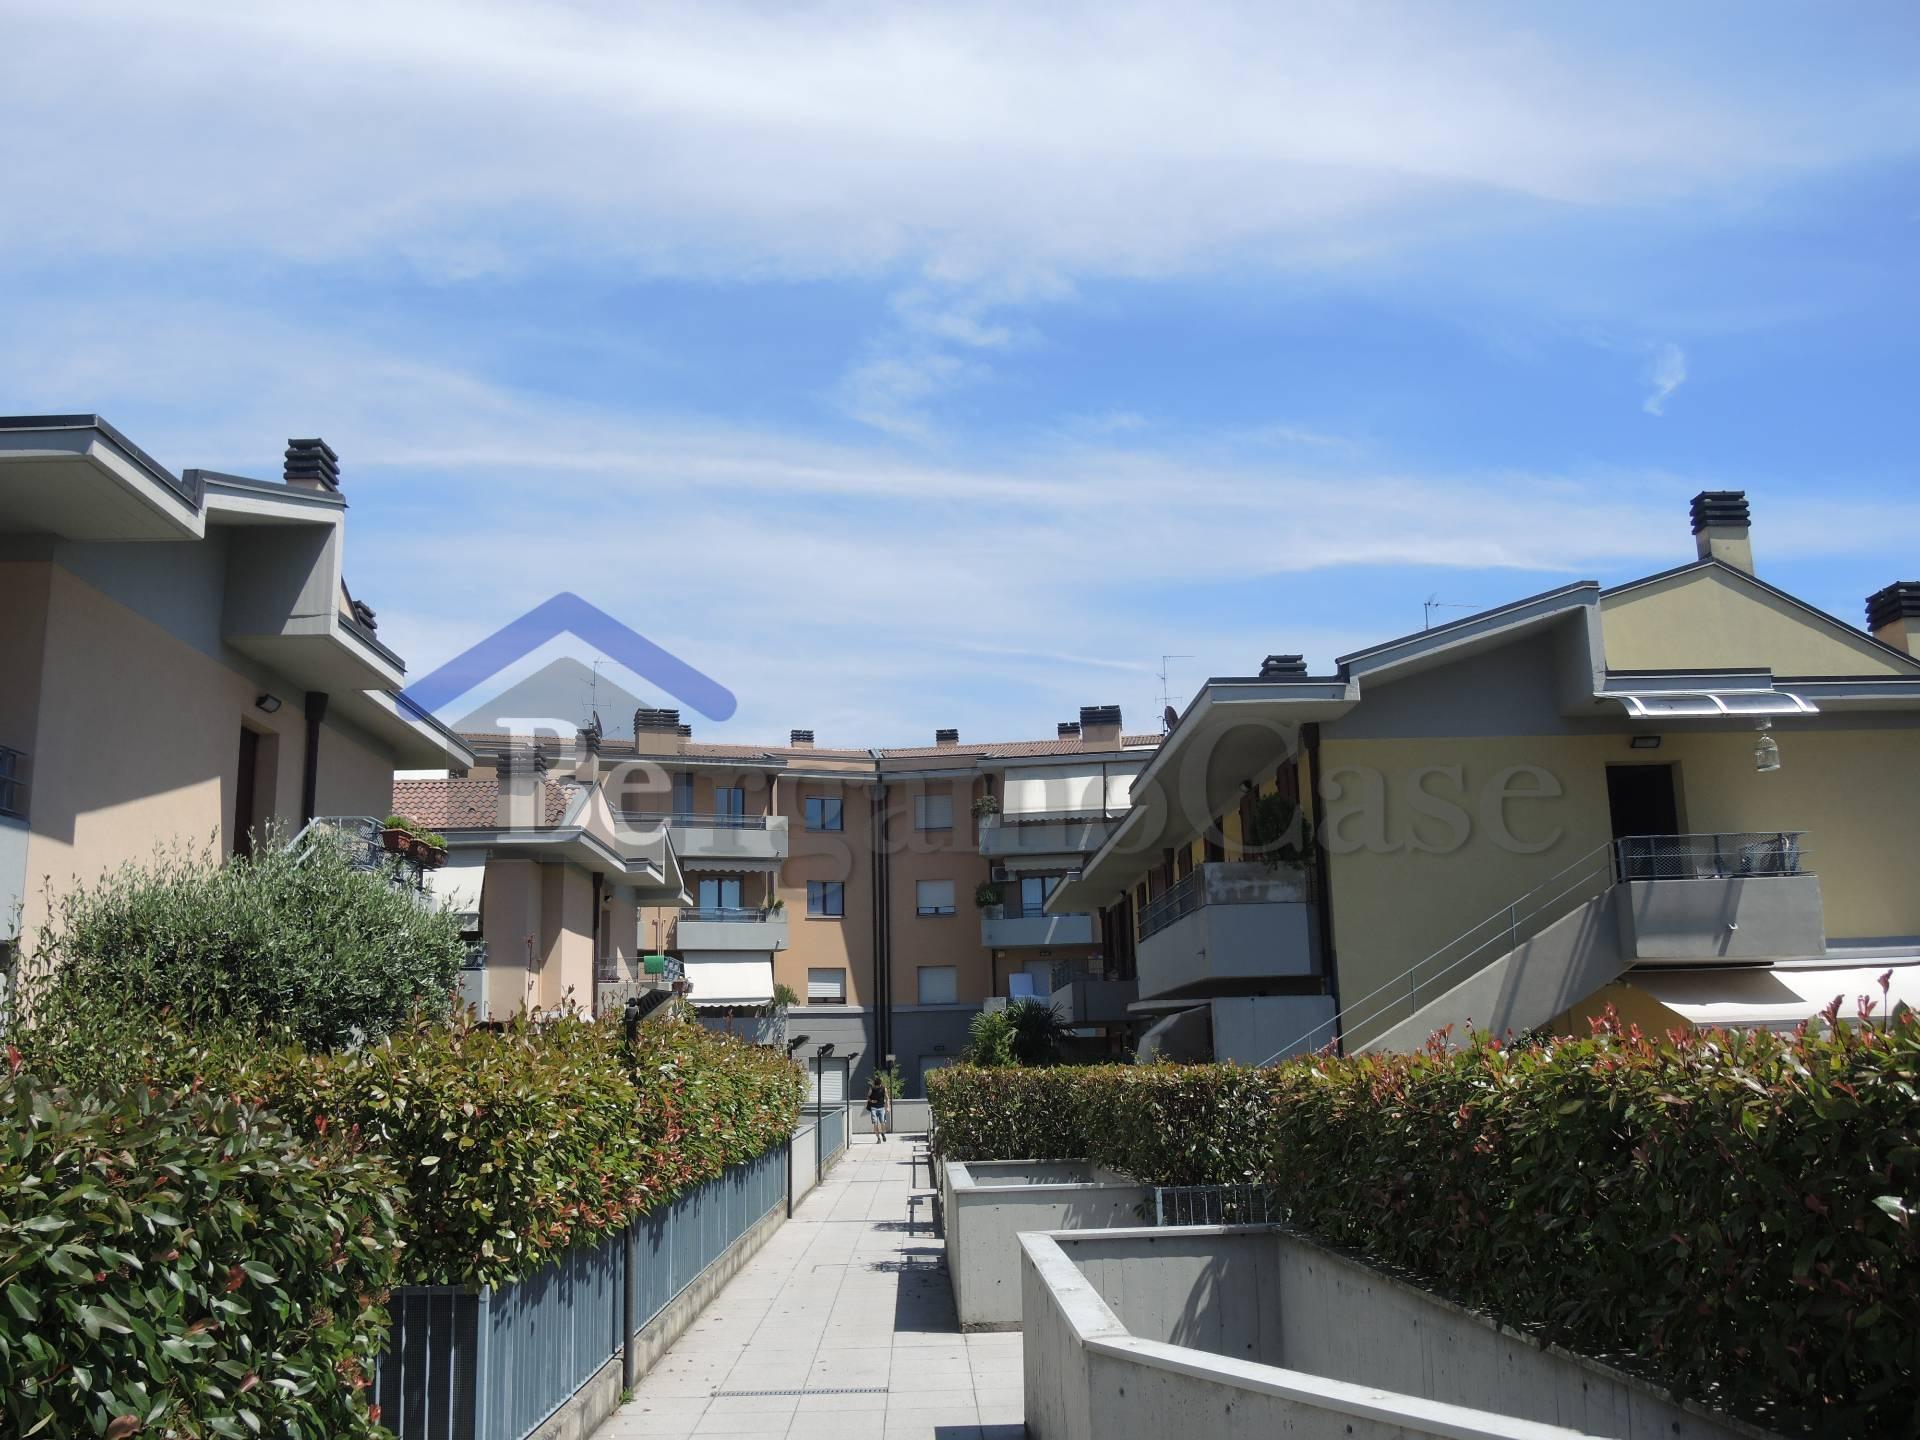 Bilocale Scanzorosciate Scanzorosciate Via Gorizia 8